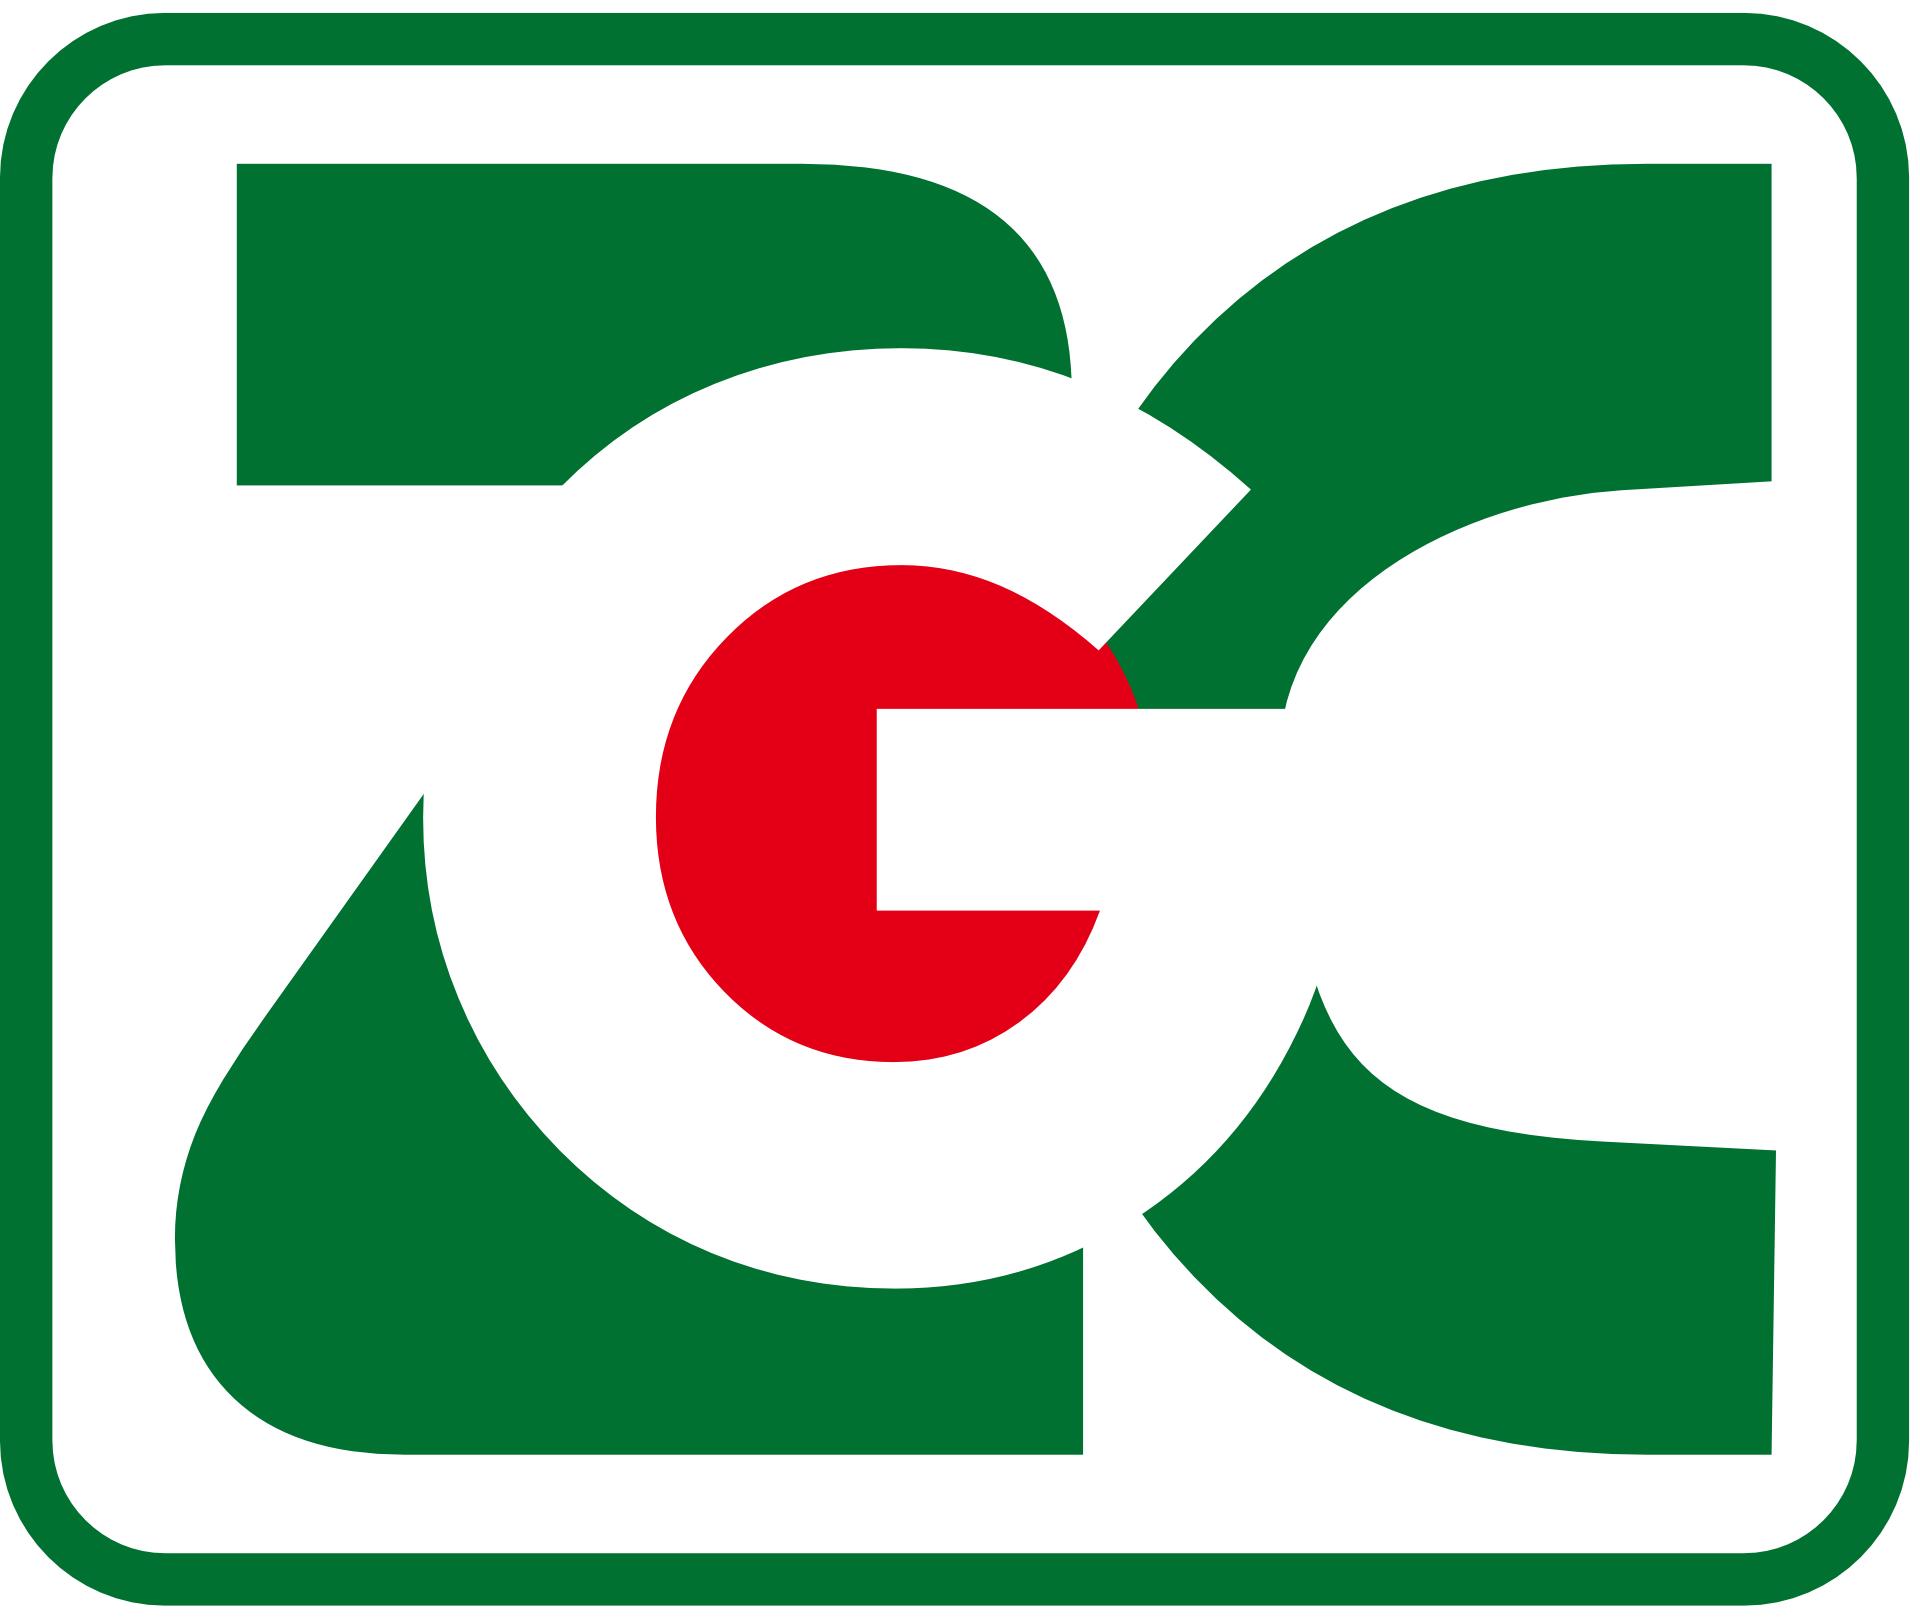 logo zgc